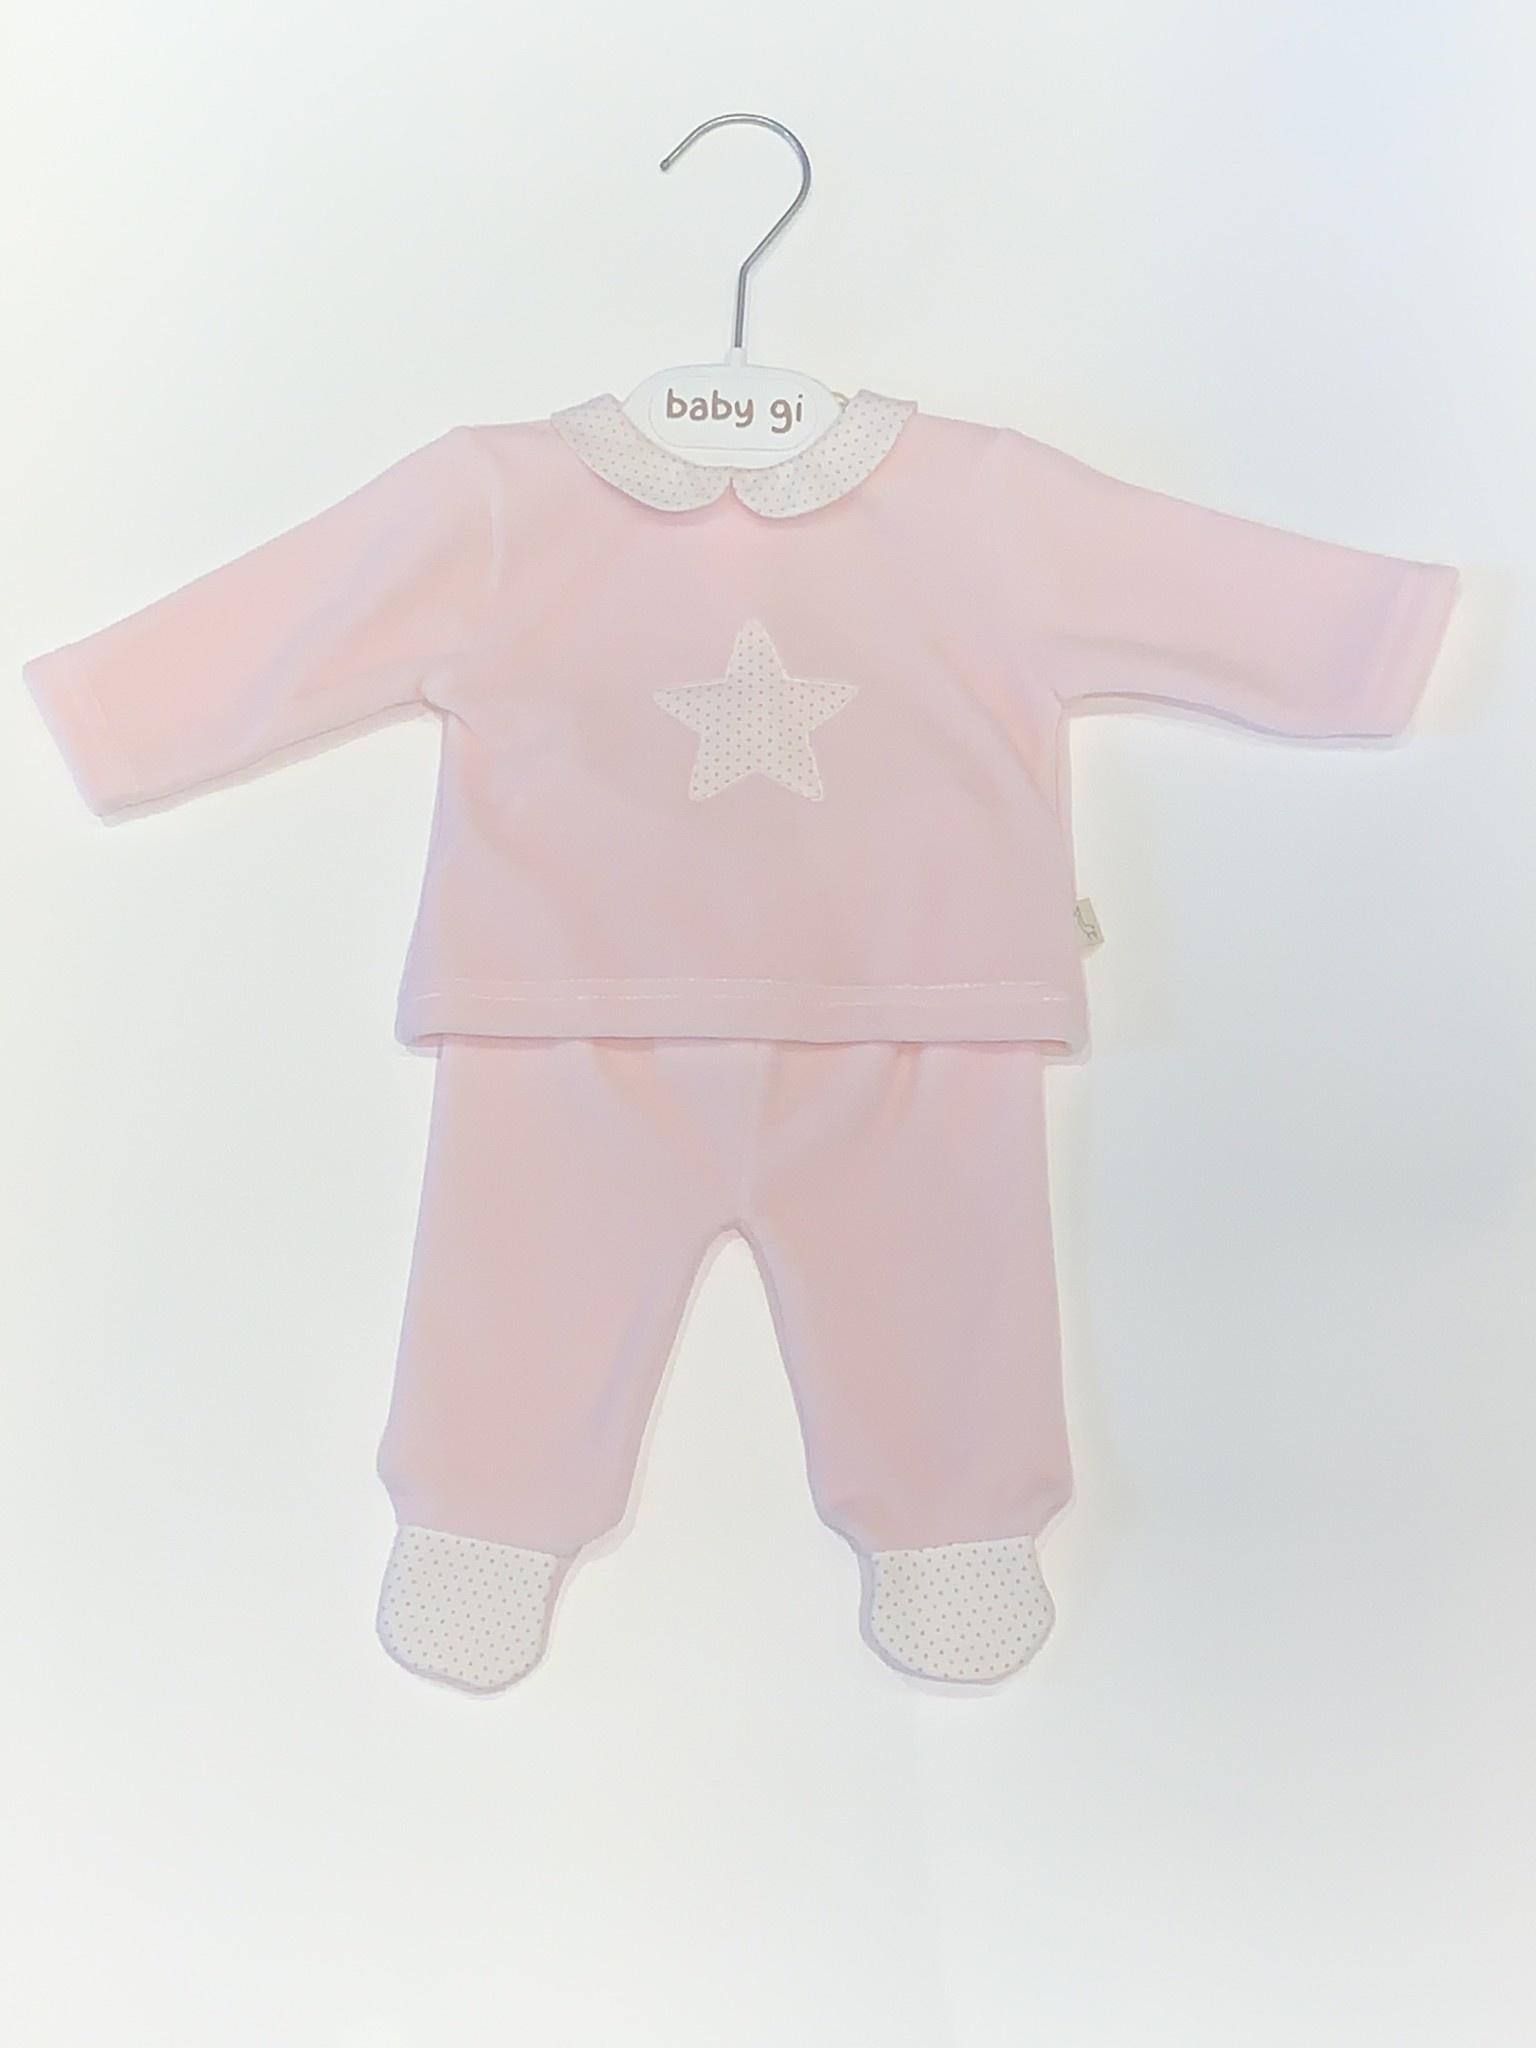 Baby Gi Baby gi pink 2 piece velour star set